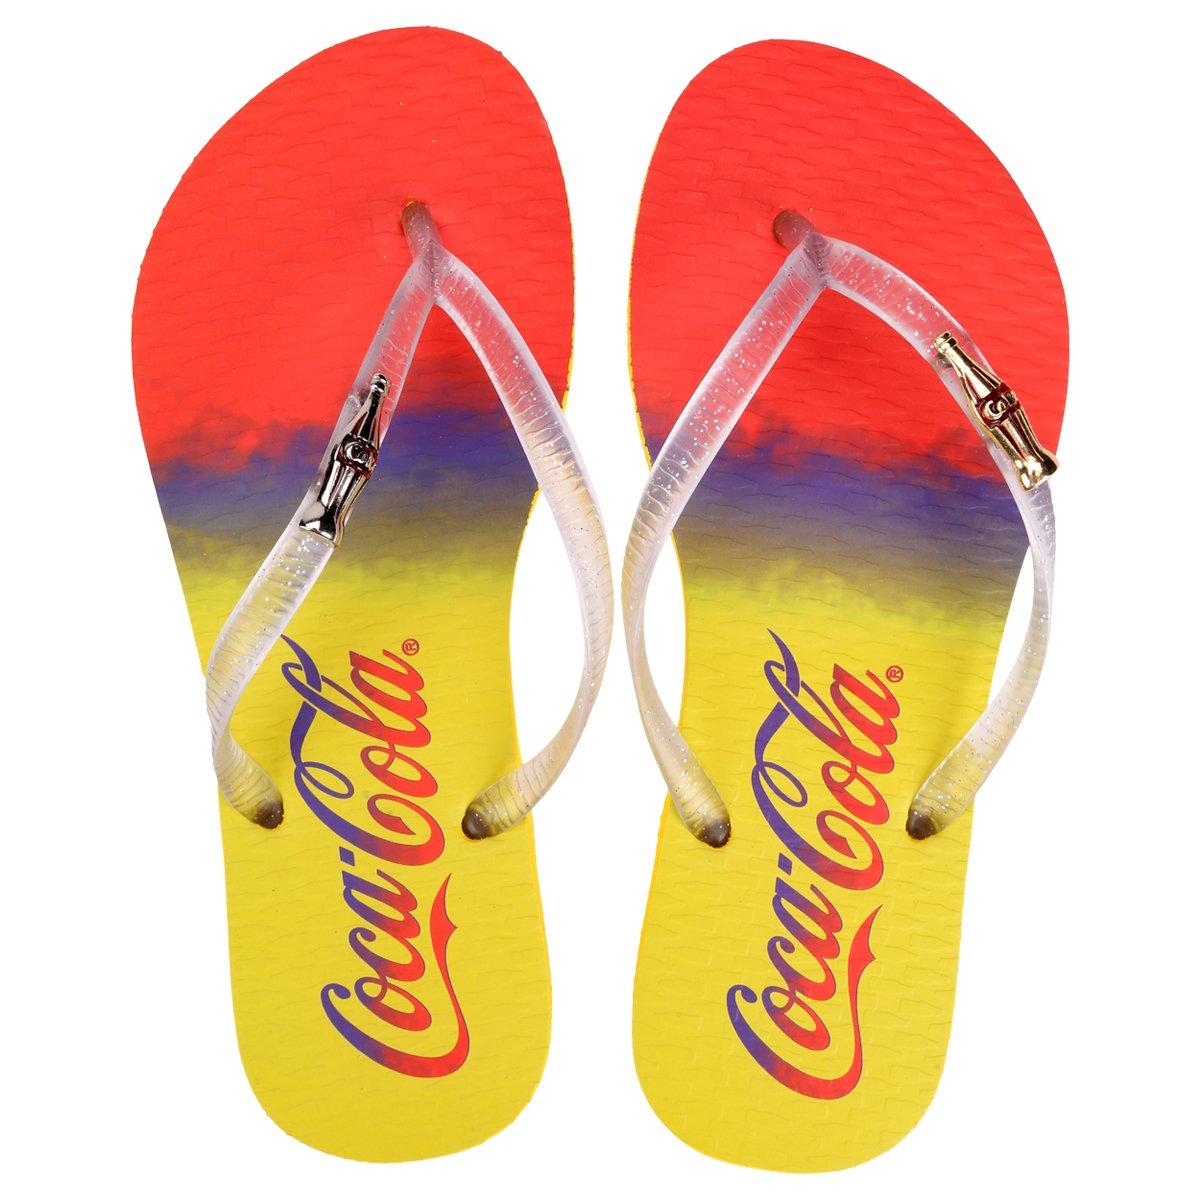 ec3a89bfb Sandália Coca-Cola Gradiente - Compre Agora